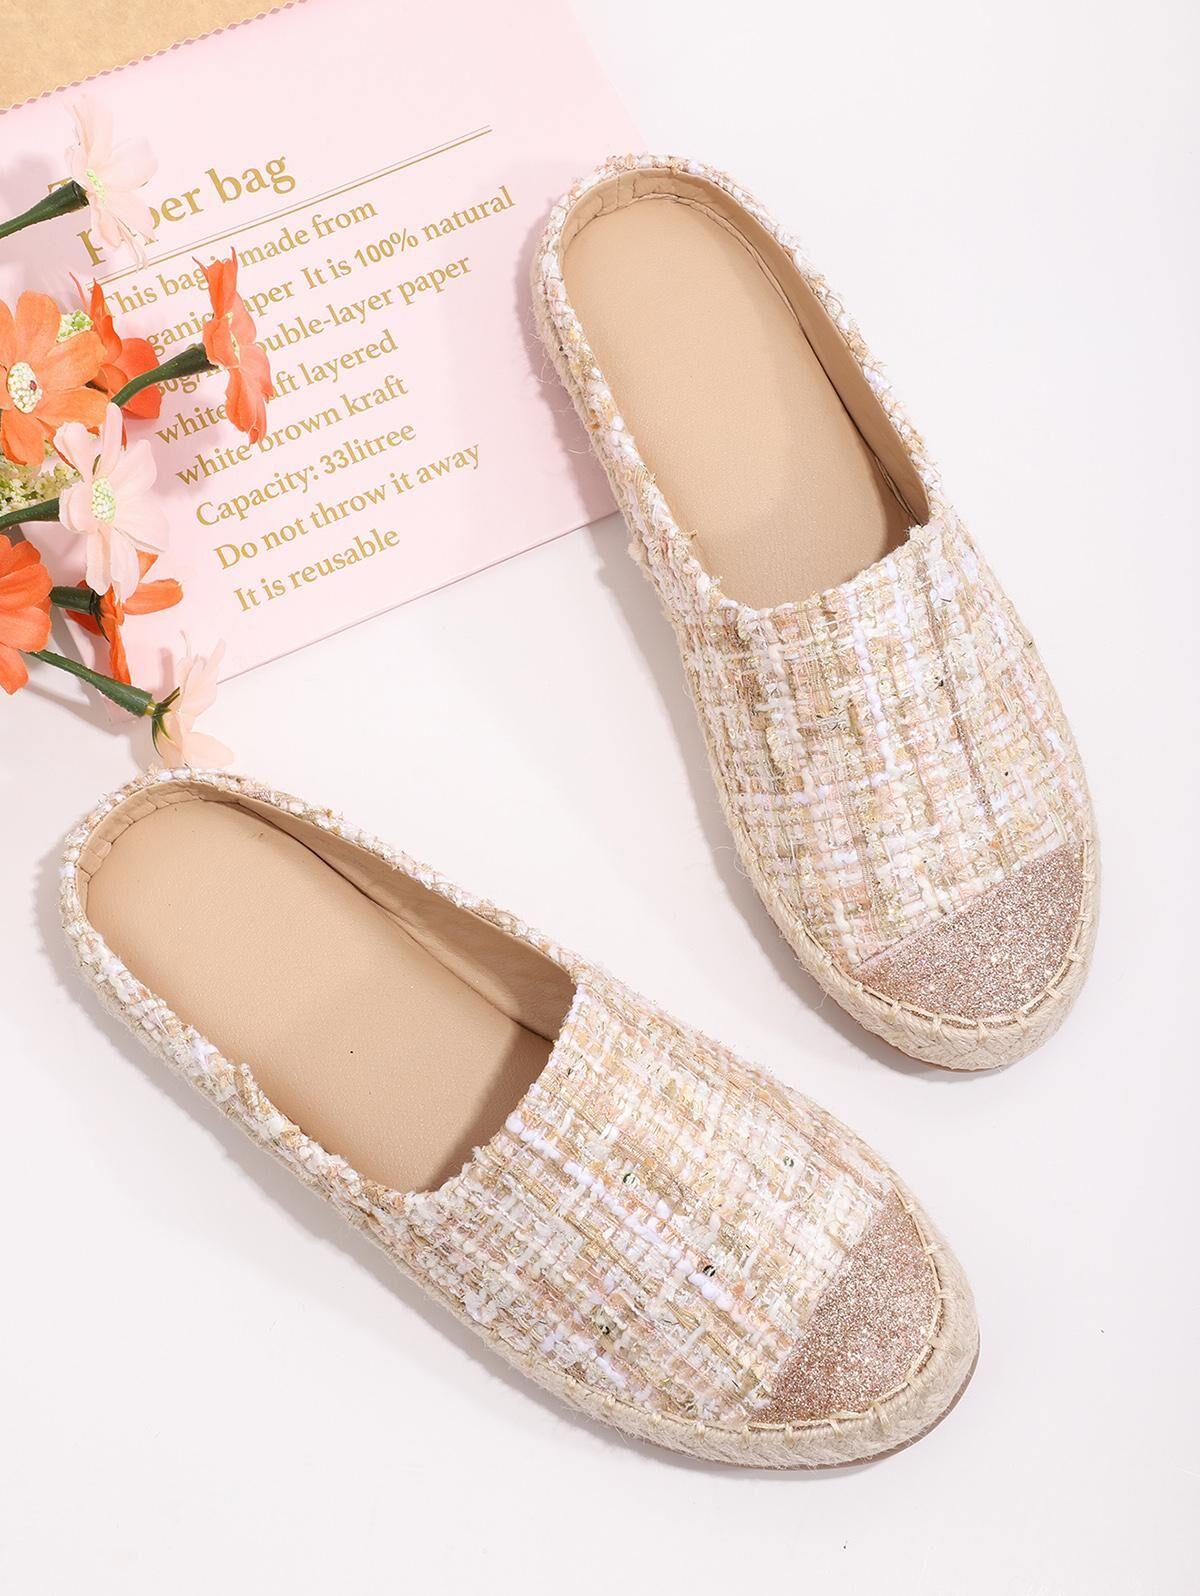 Shiny Toe Tweed Half Flat Shoes in SAKURA PINK - Size: EU 39